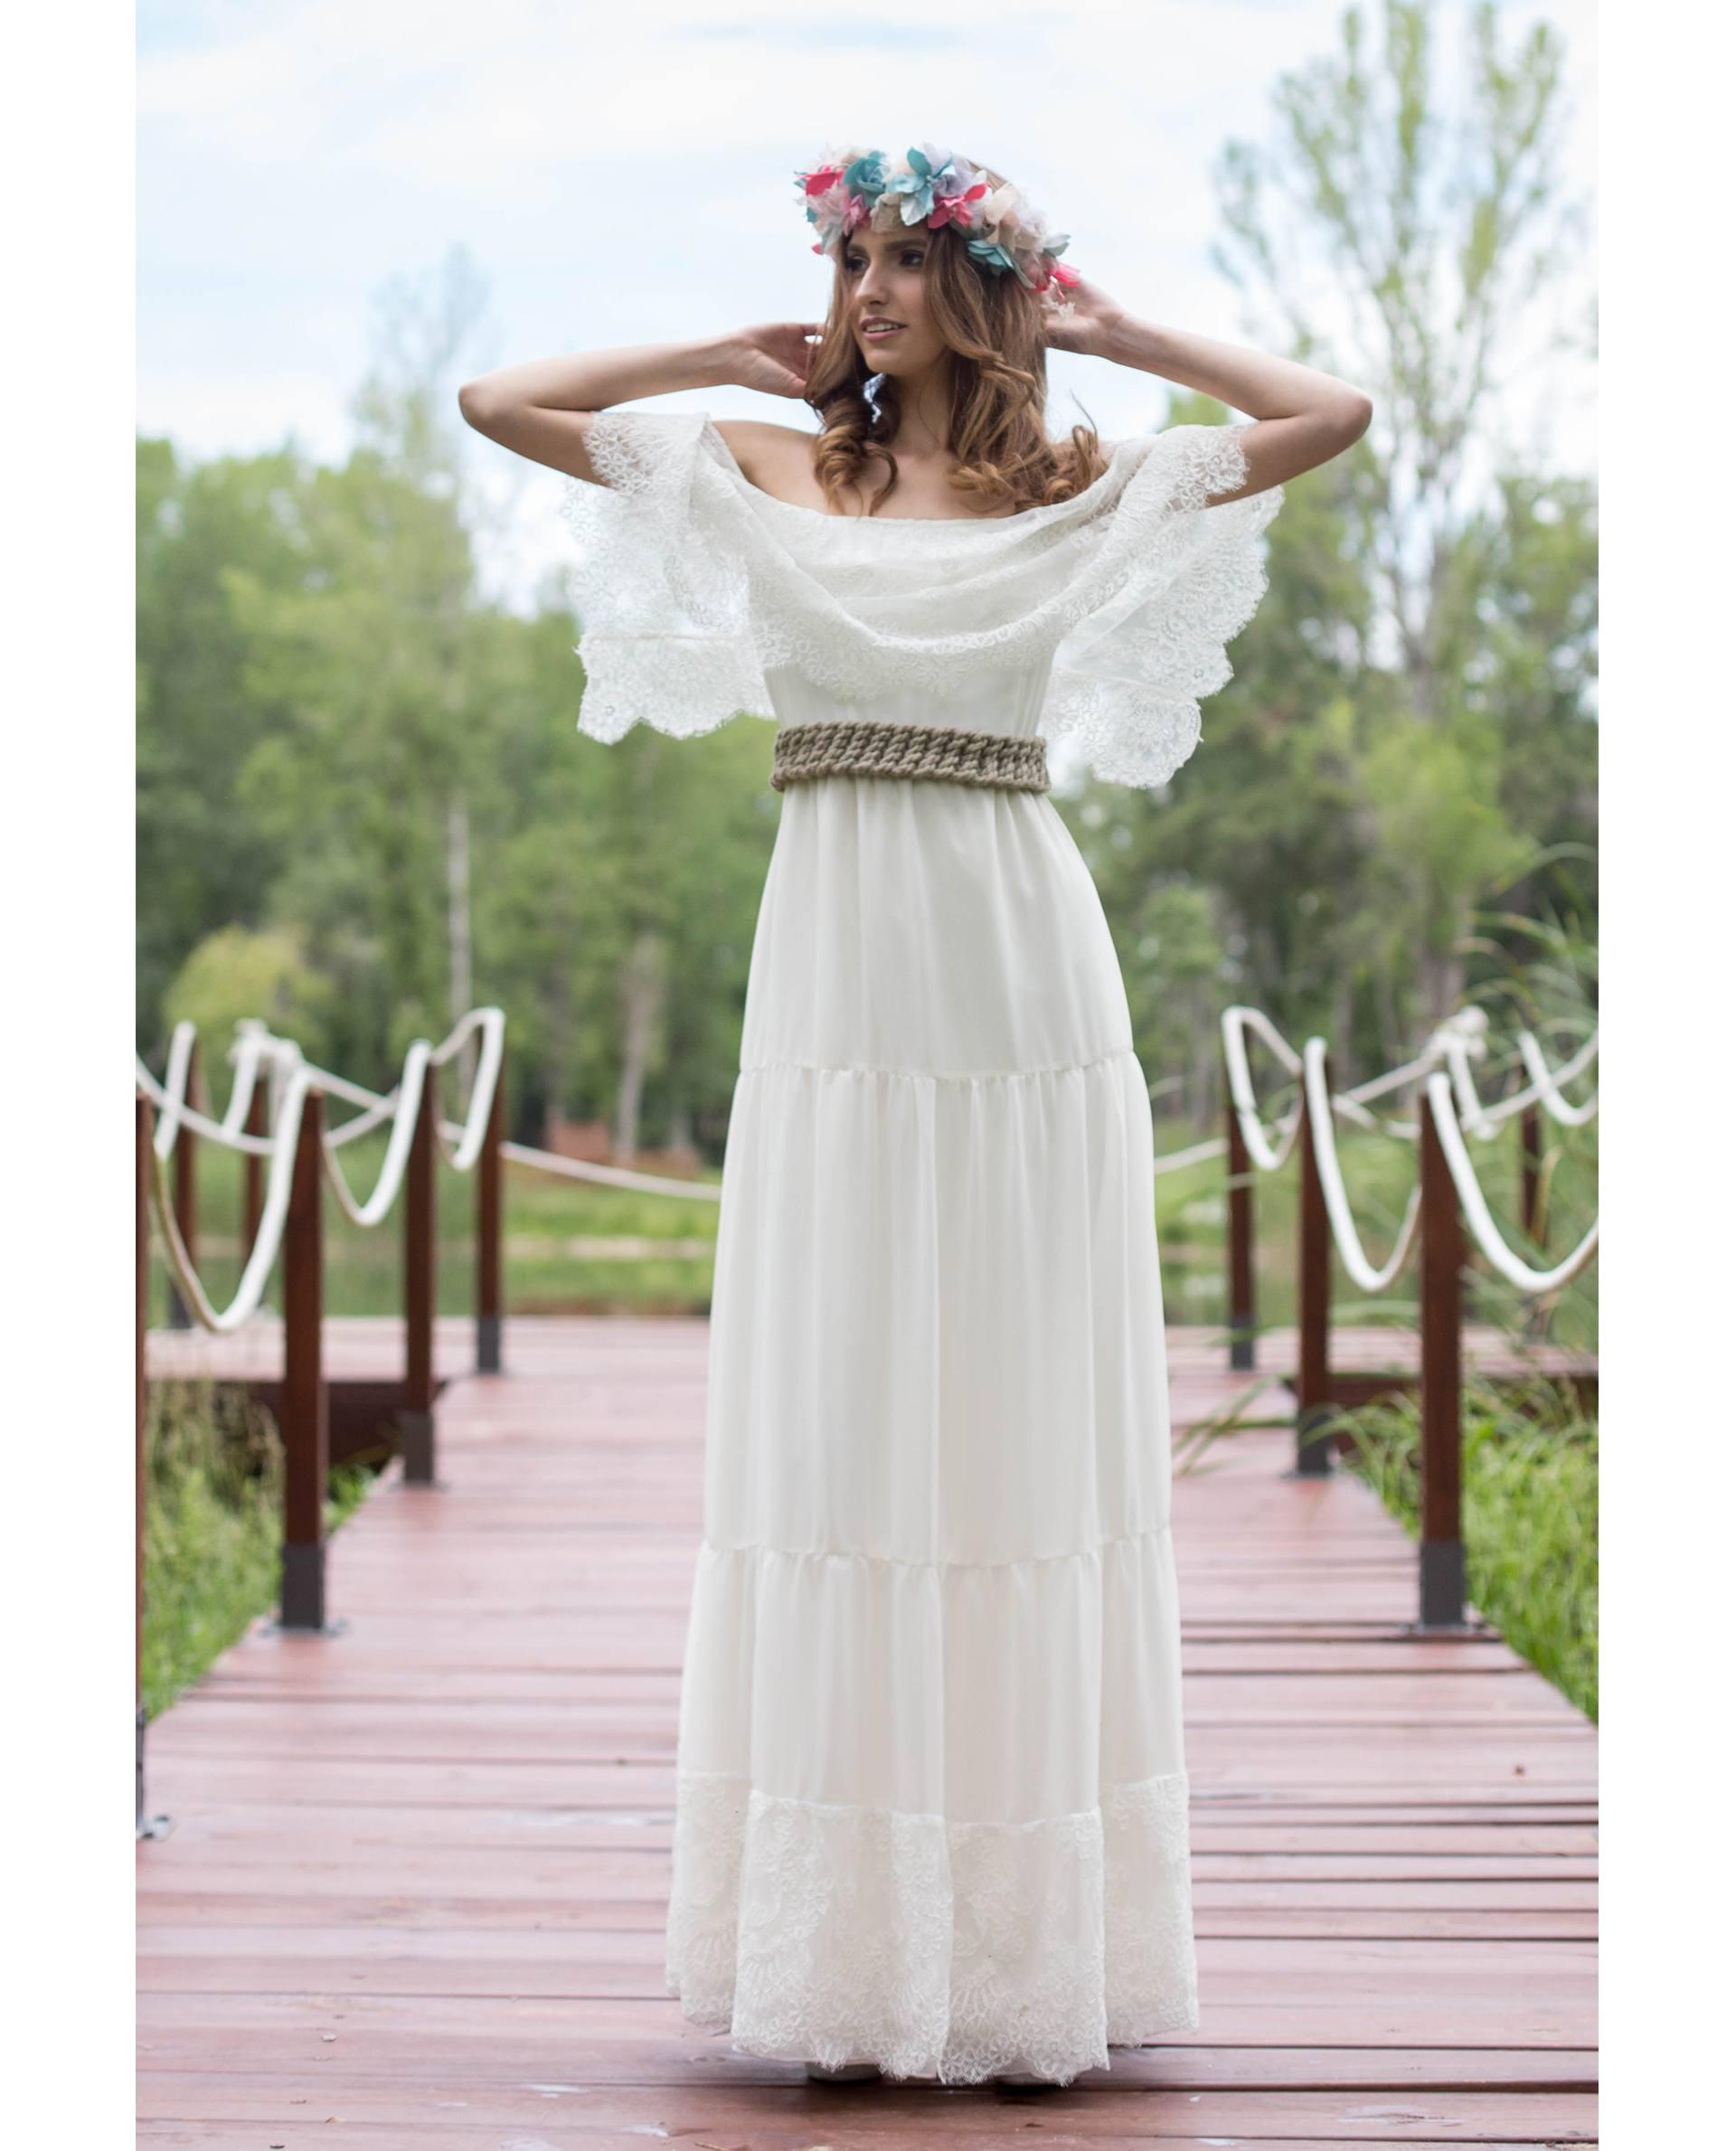 BRIDAL-NATURE 2019 - VESTIDOS - vestido novia Frida